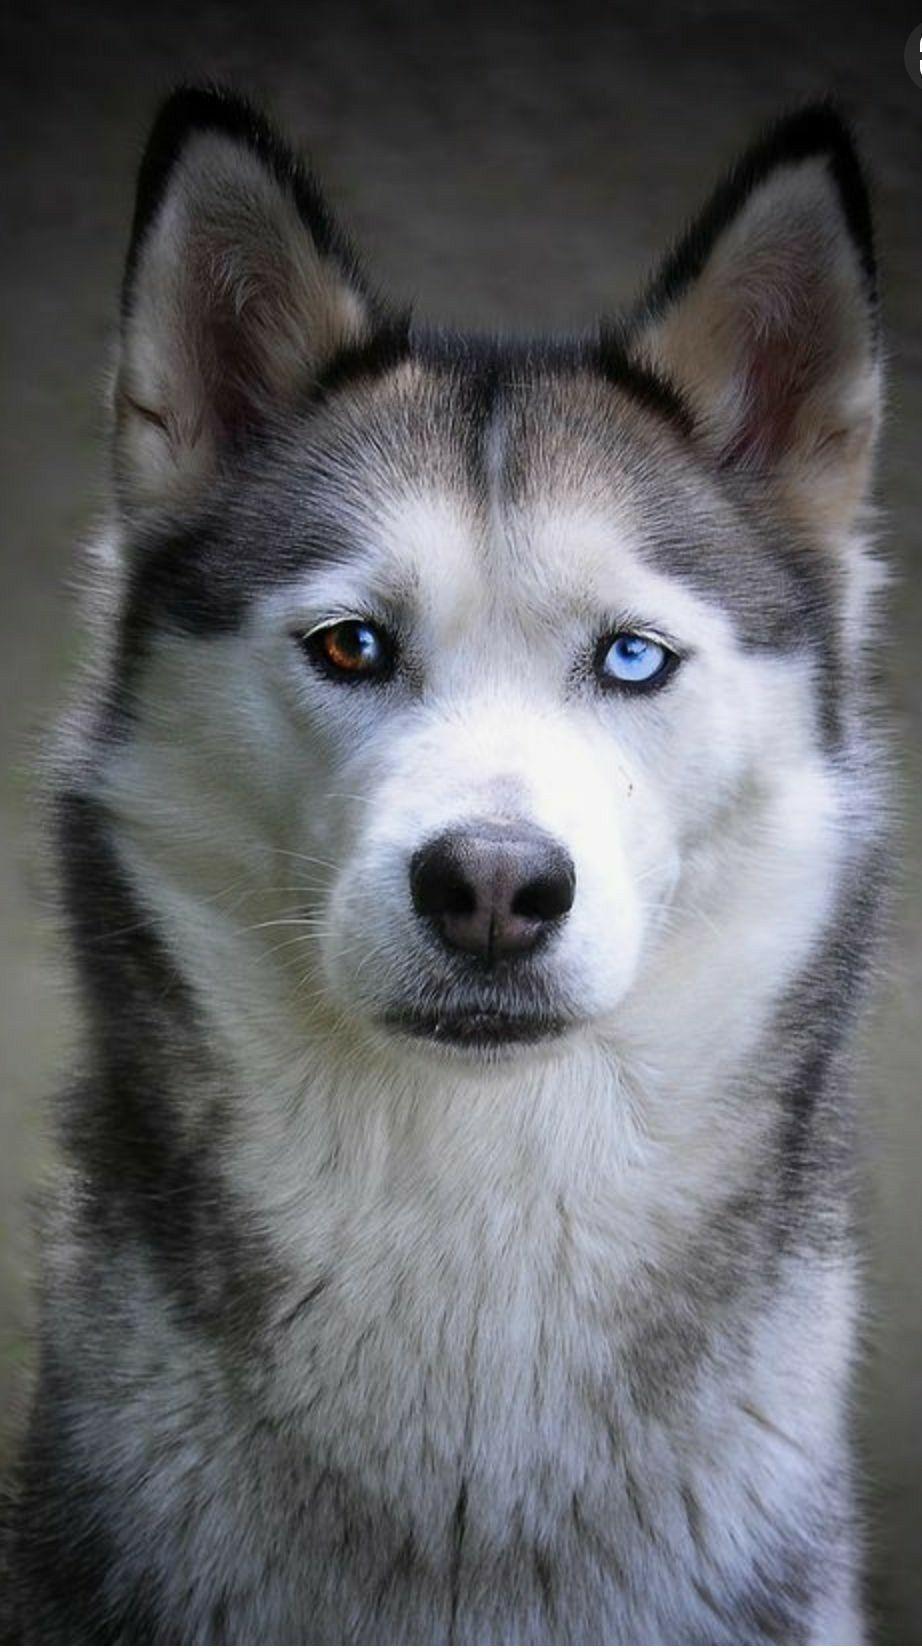 Siberianhusky Siberian Husky Dog Husky Dogs Siberian Husky